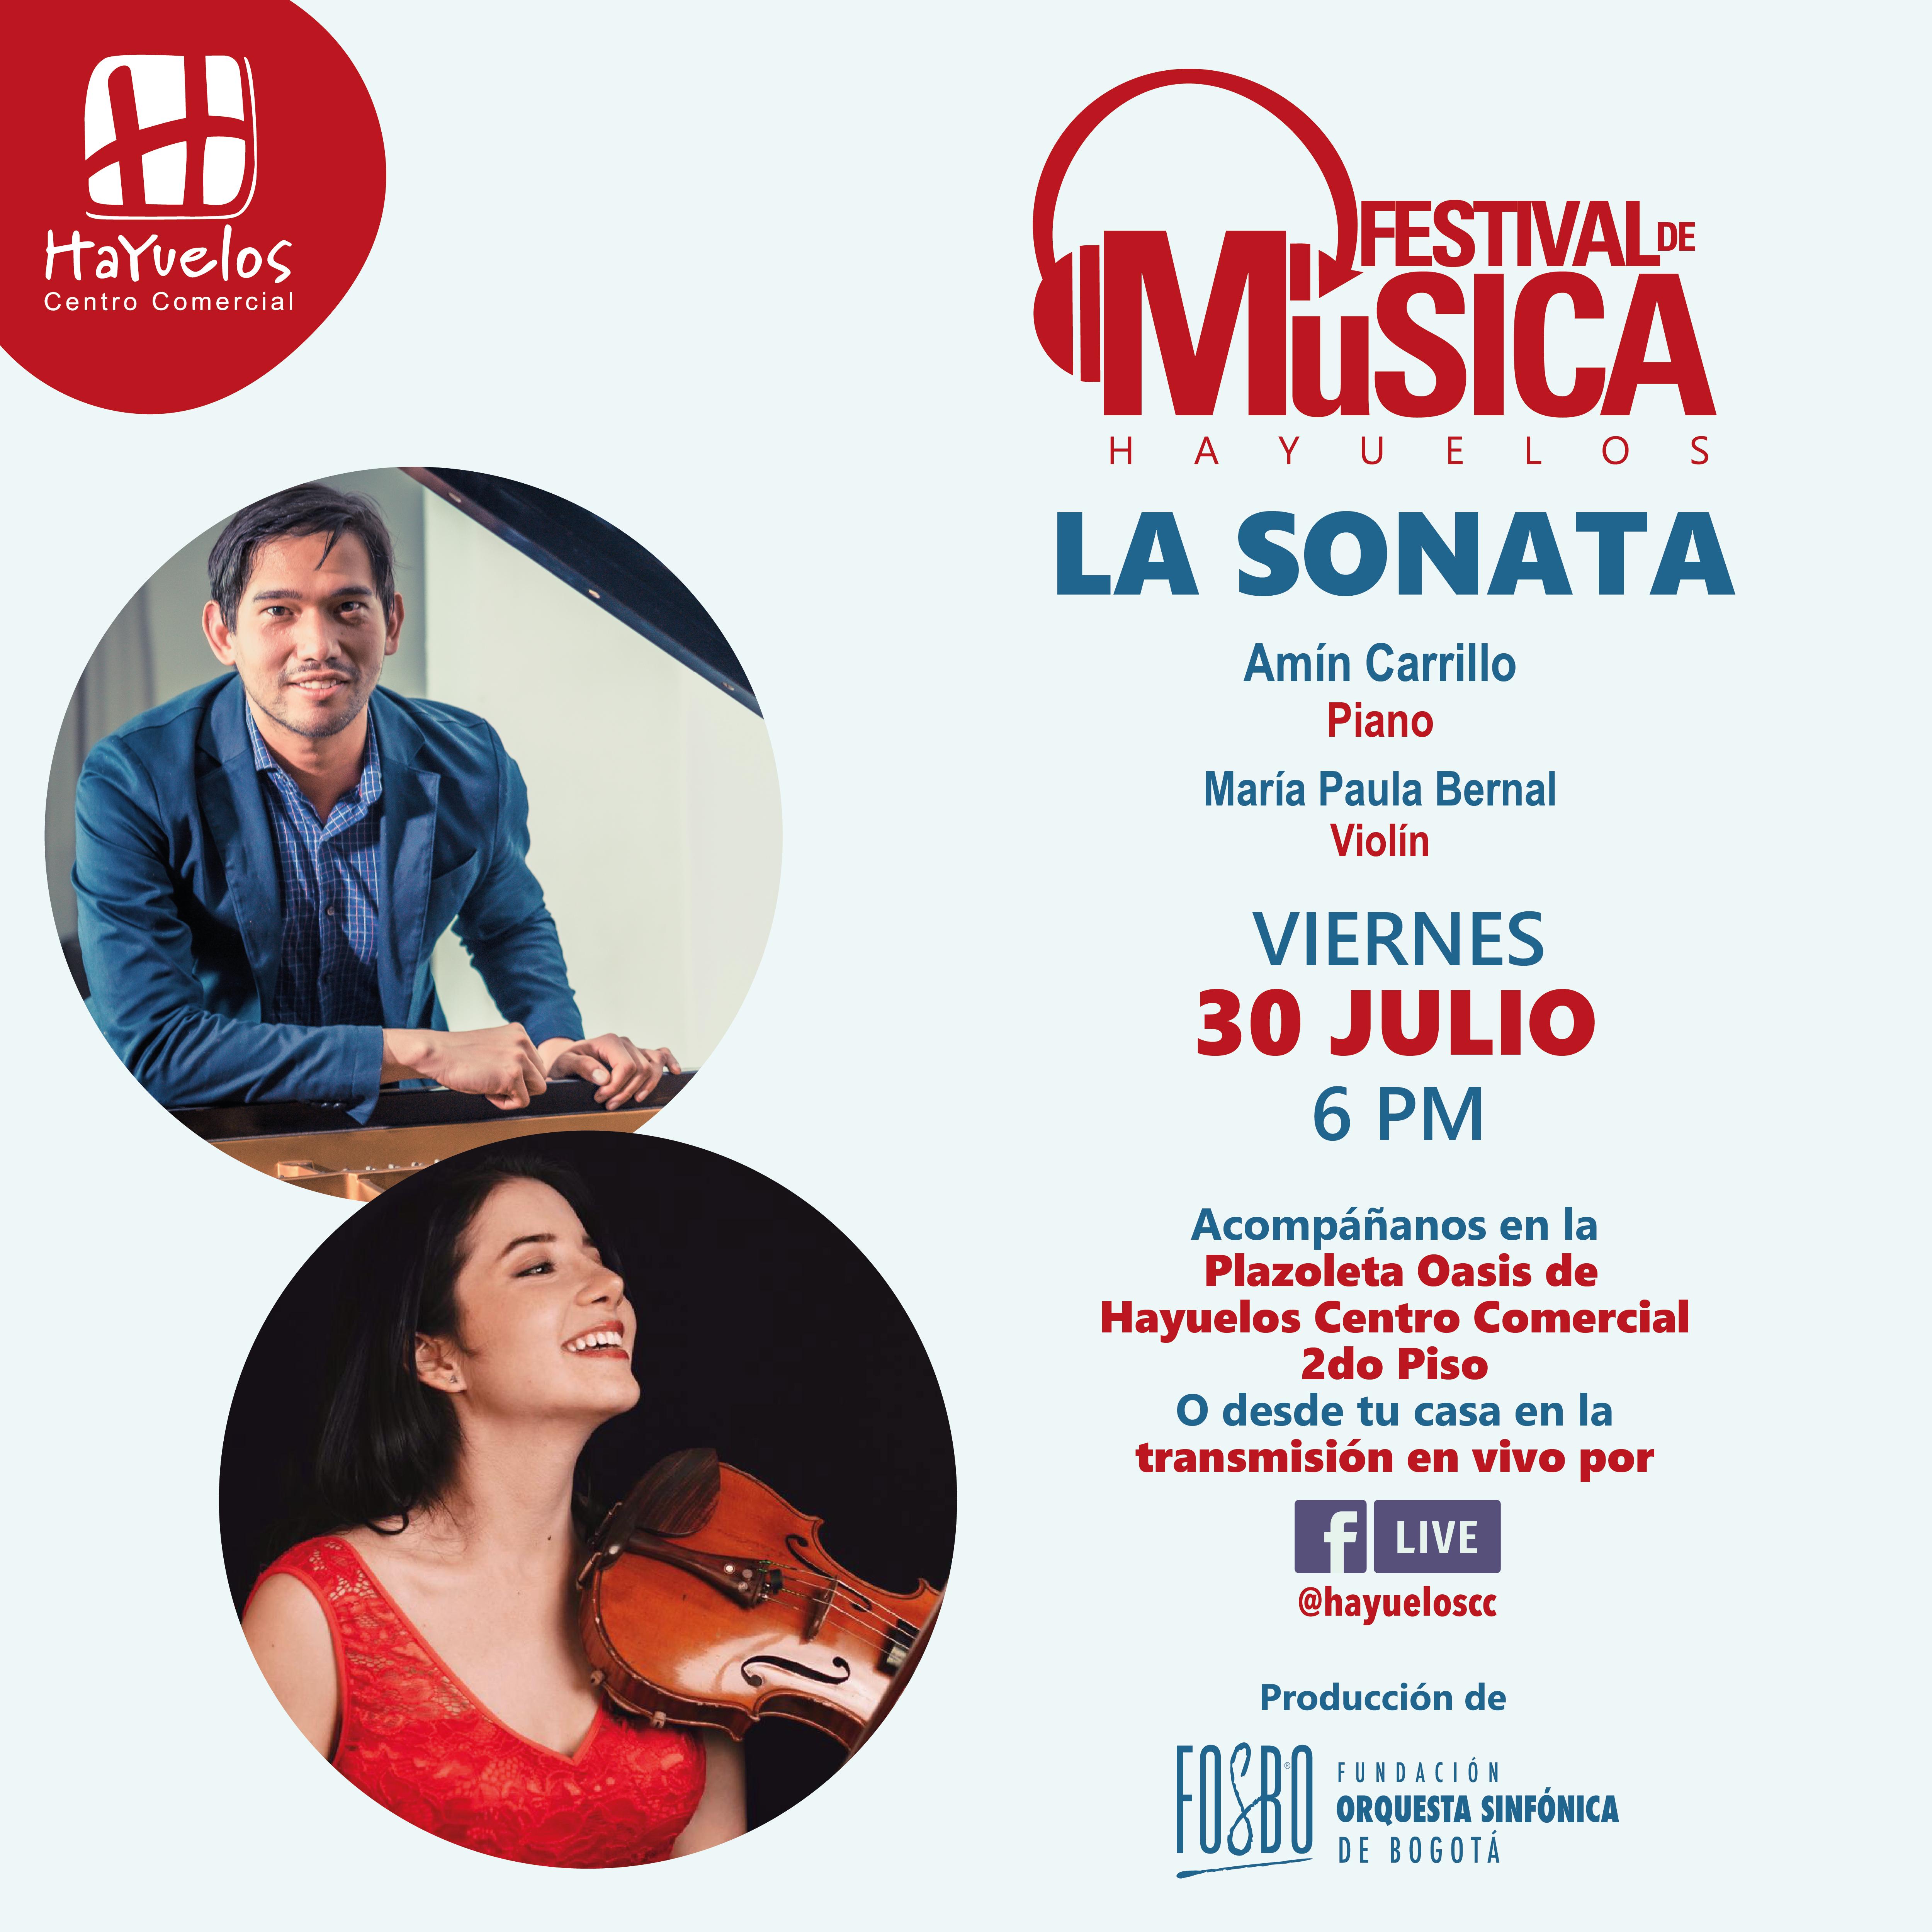 La sonata Festival de música Hayuelos Fosbo